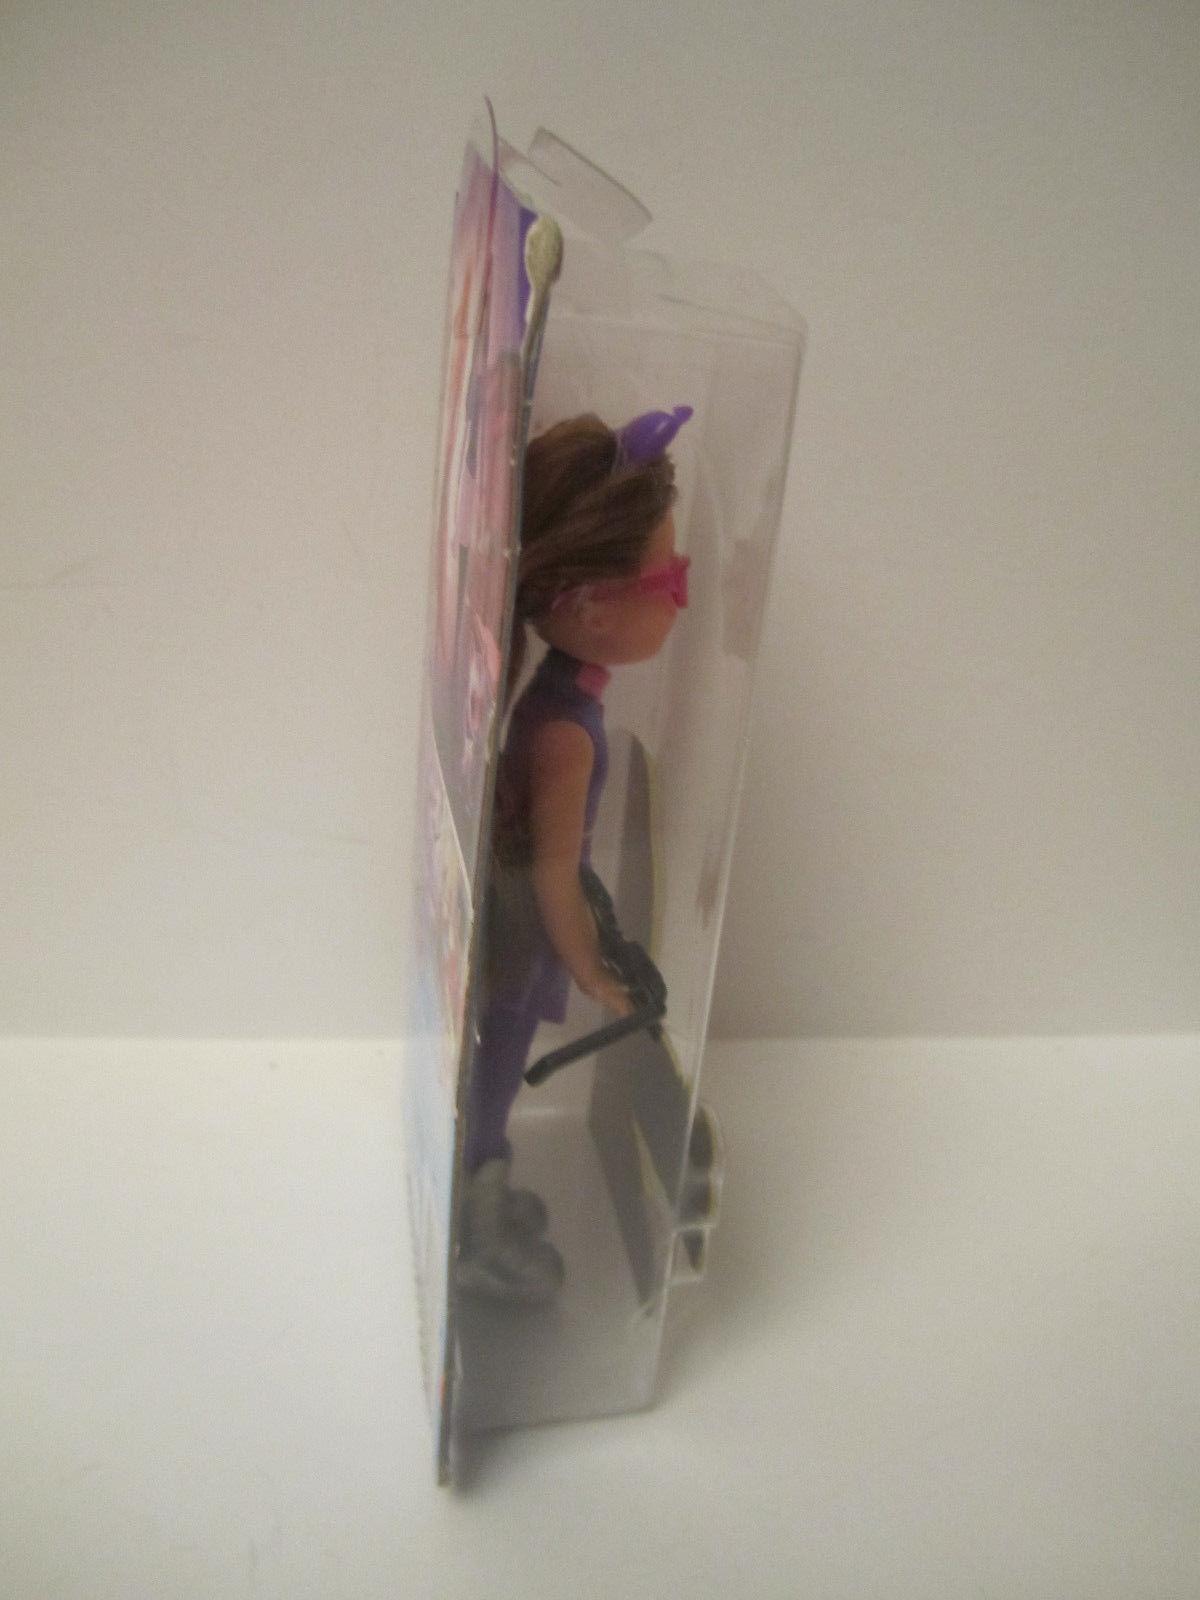 NRFB Barbie Sister Chelsea Barbie Spy Squad Doll Purple 2015 New Brunette Hair image 4